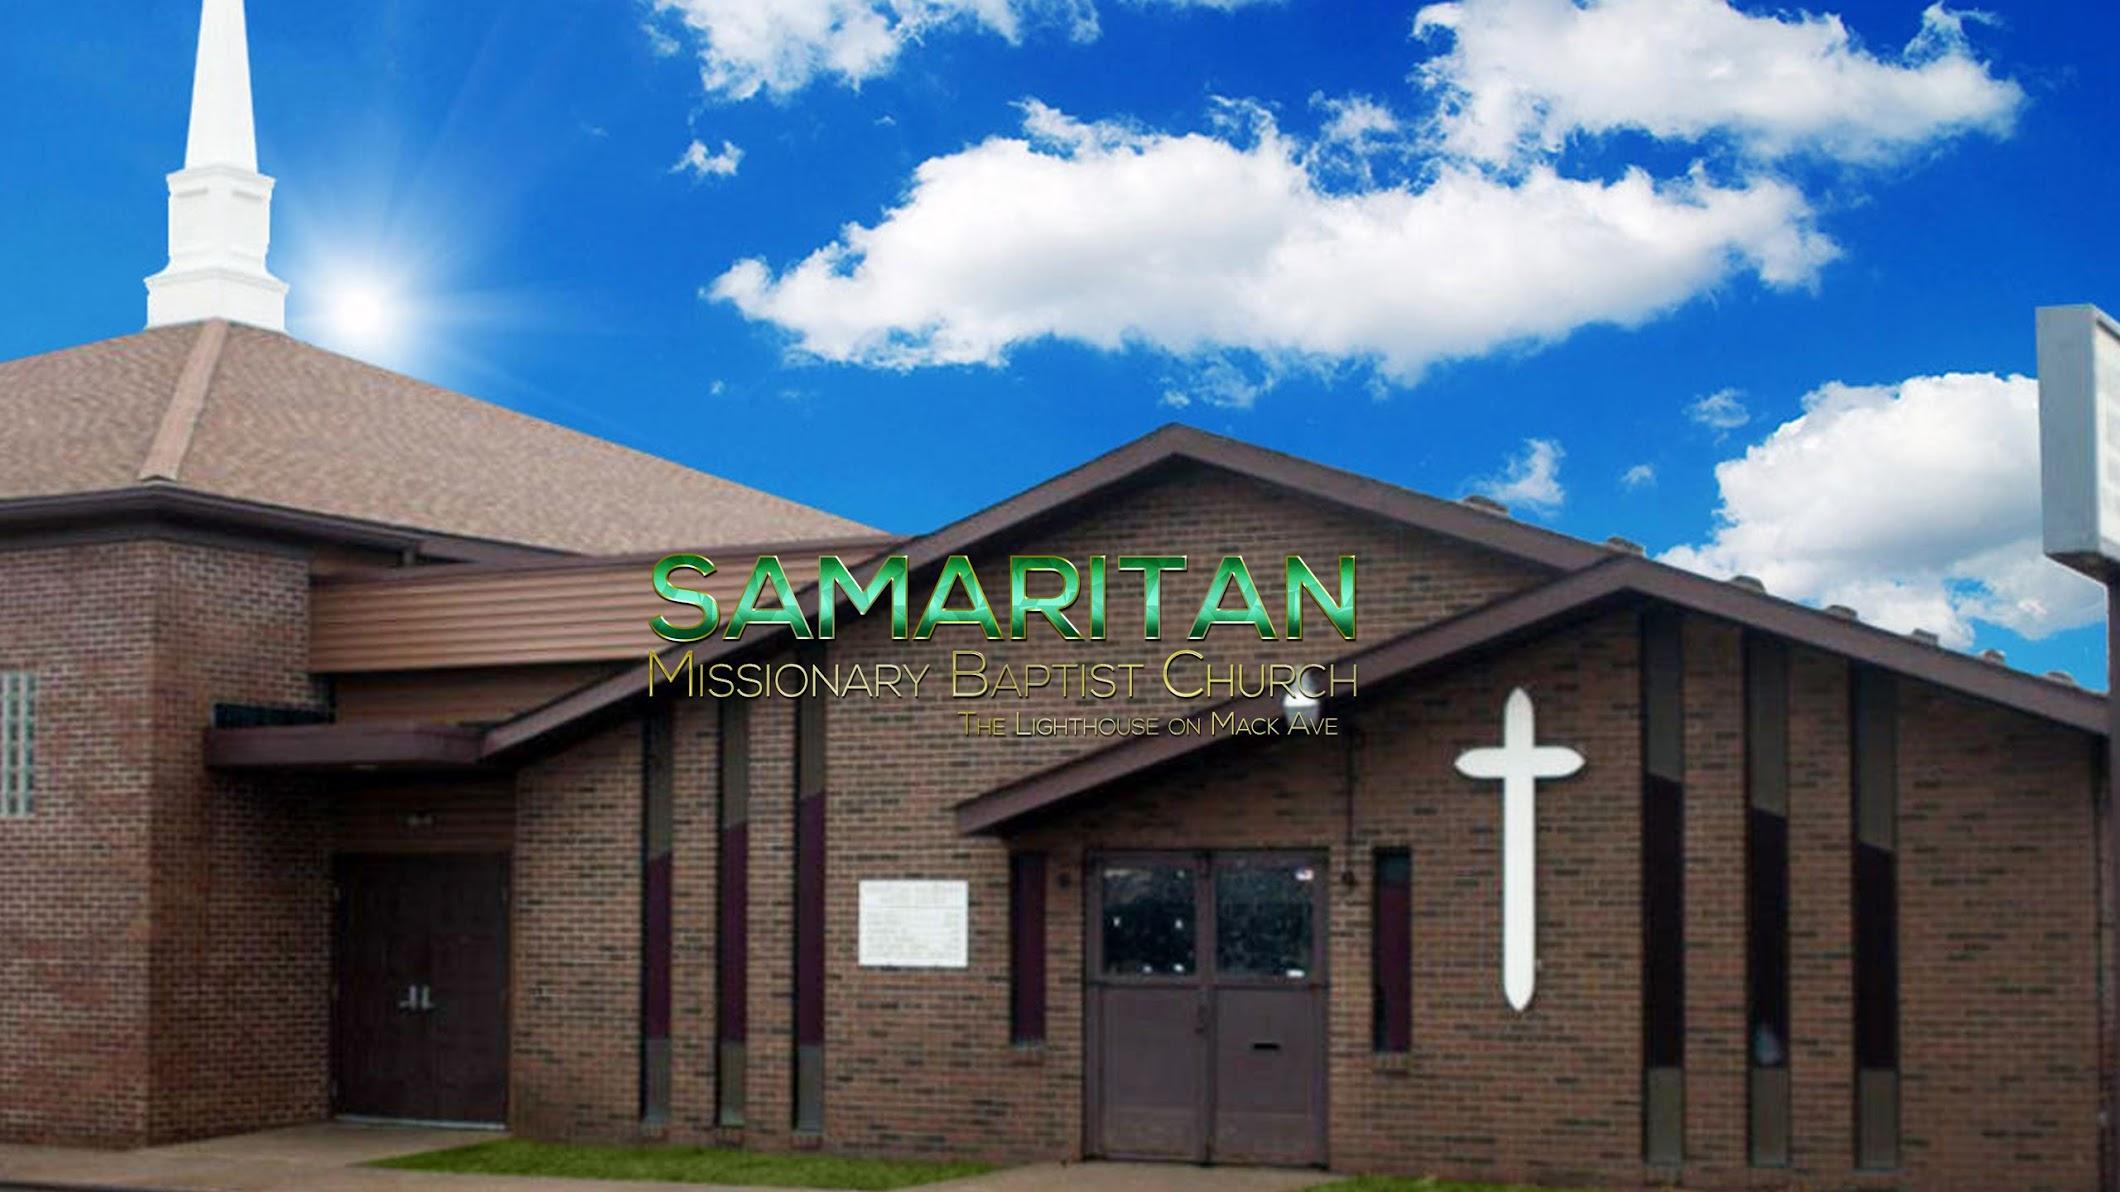 Samaritan MBC The Lighthouse